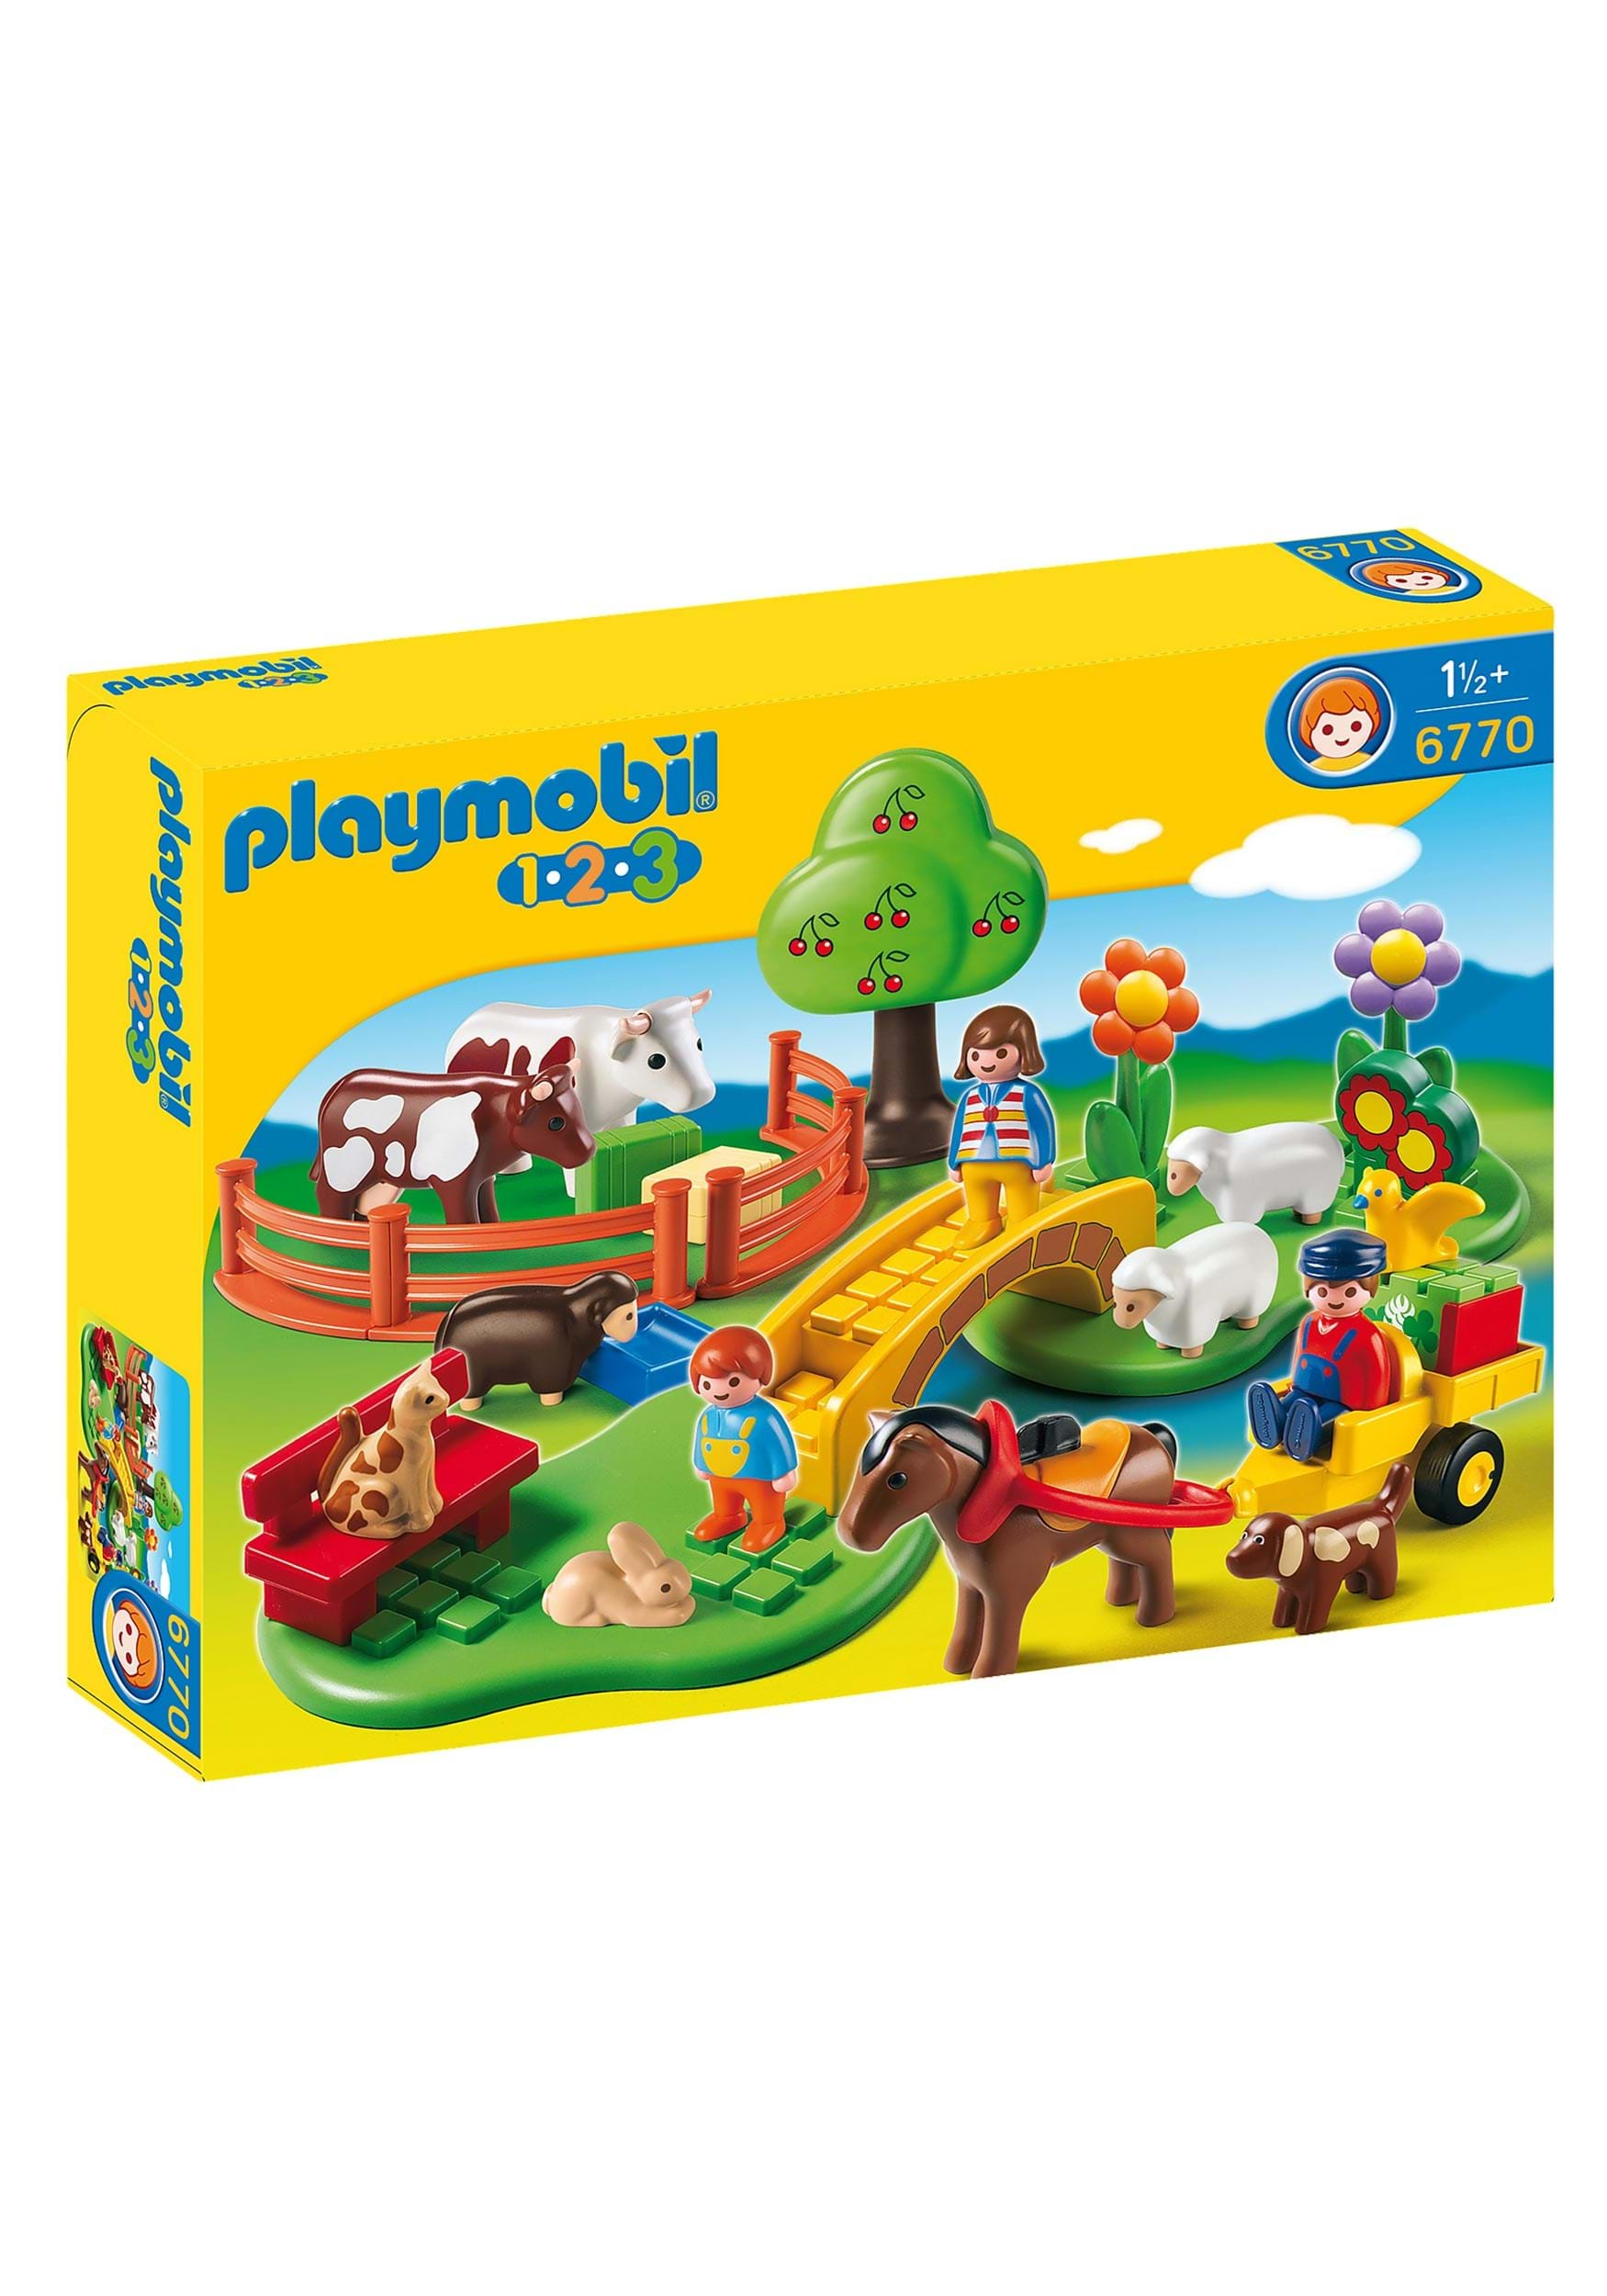 1.2.3. Countryside Playmobil